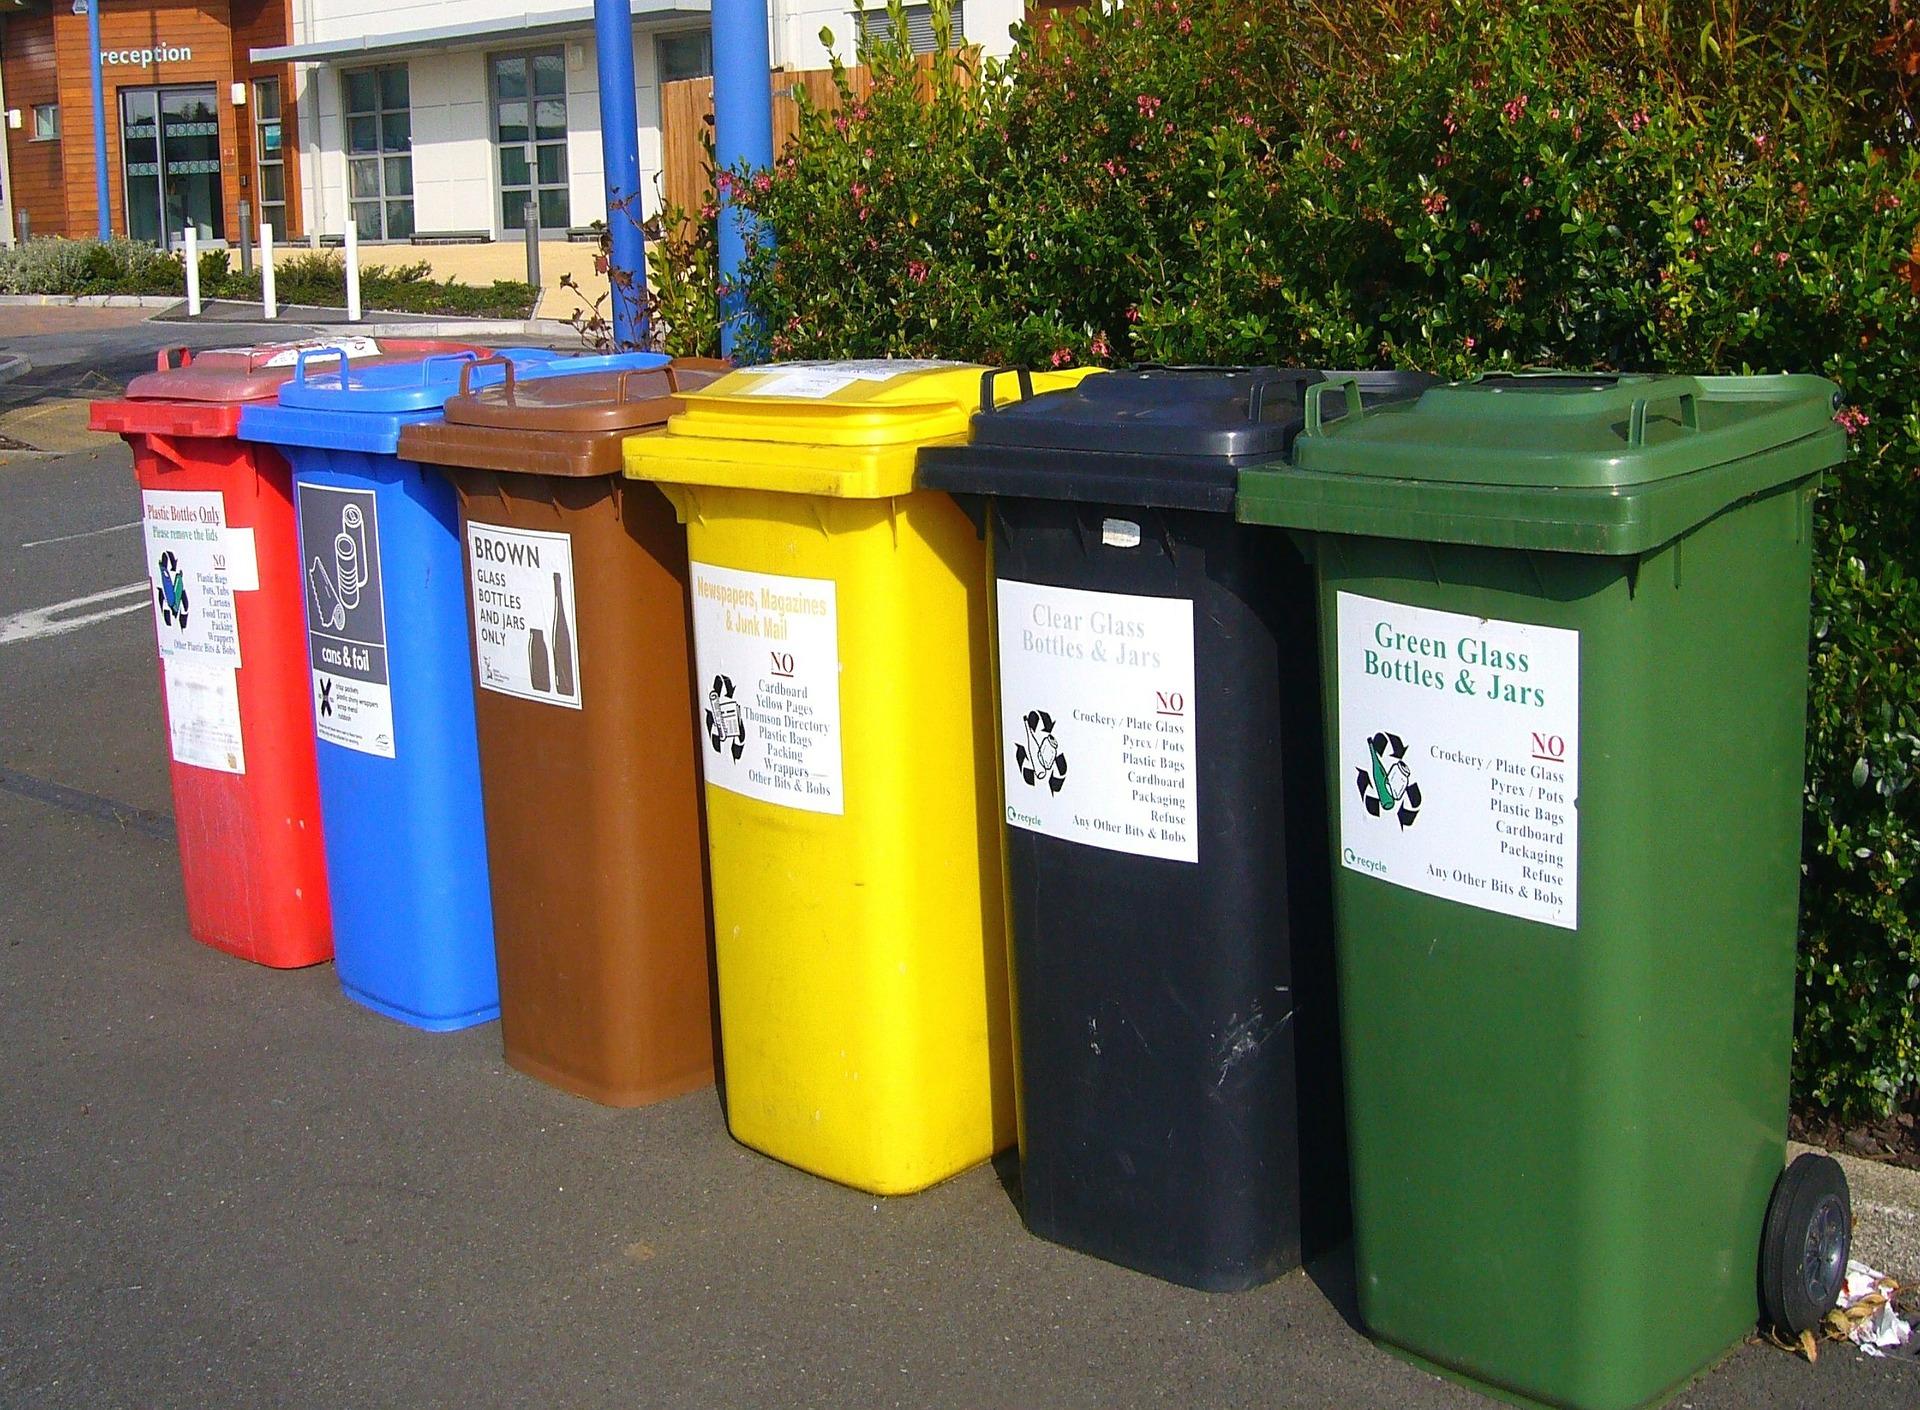 Recycling bins 373156 1920